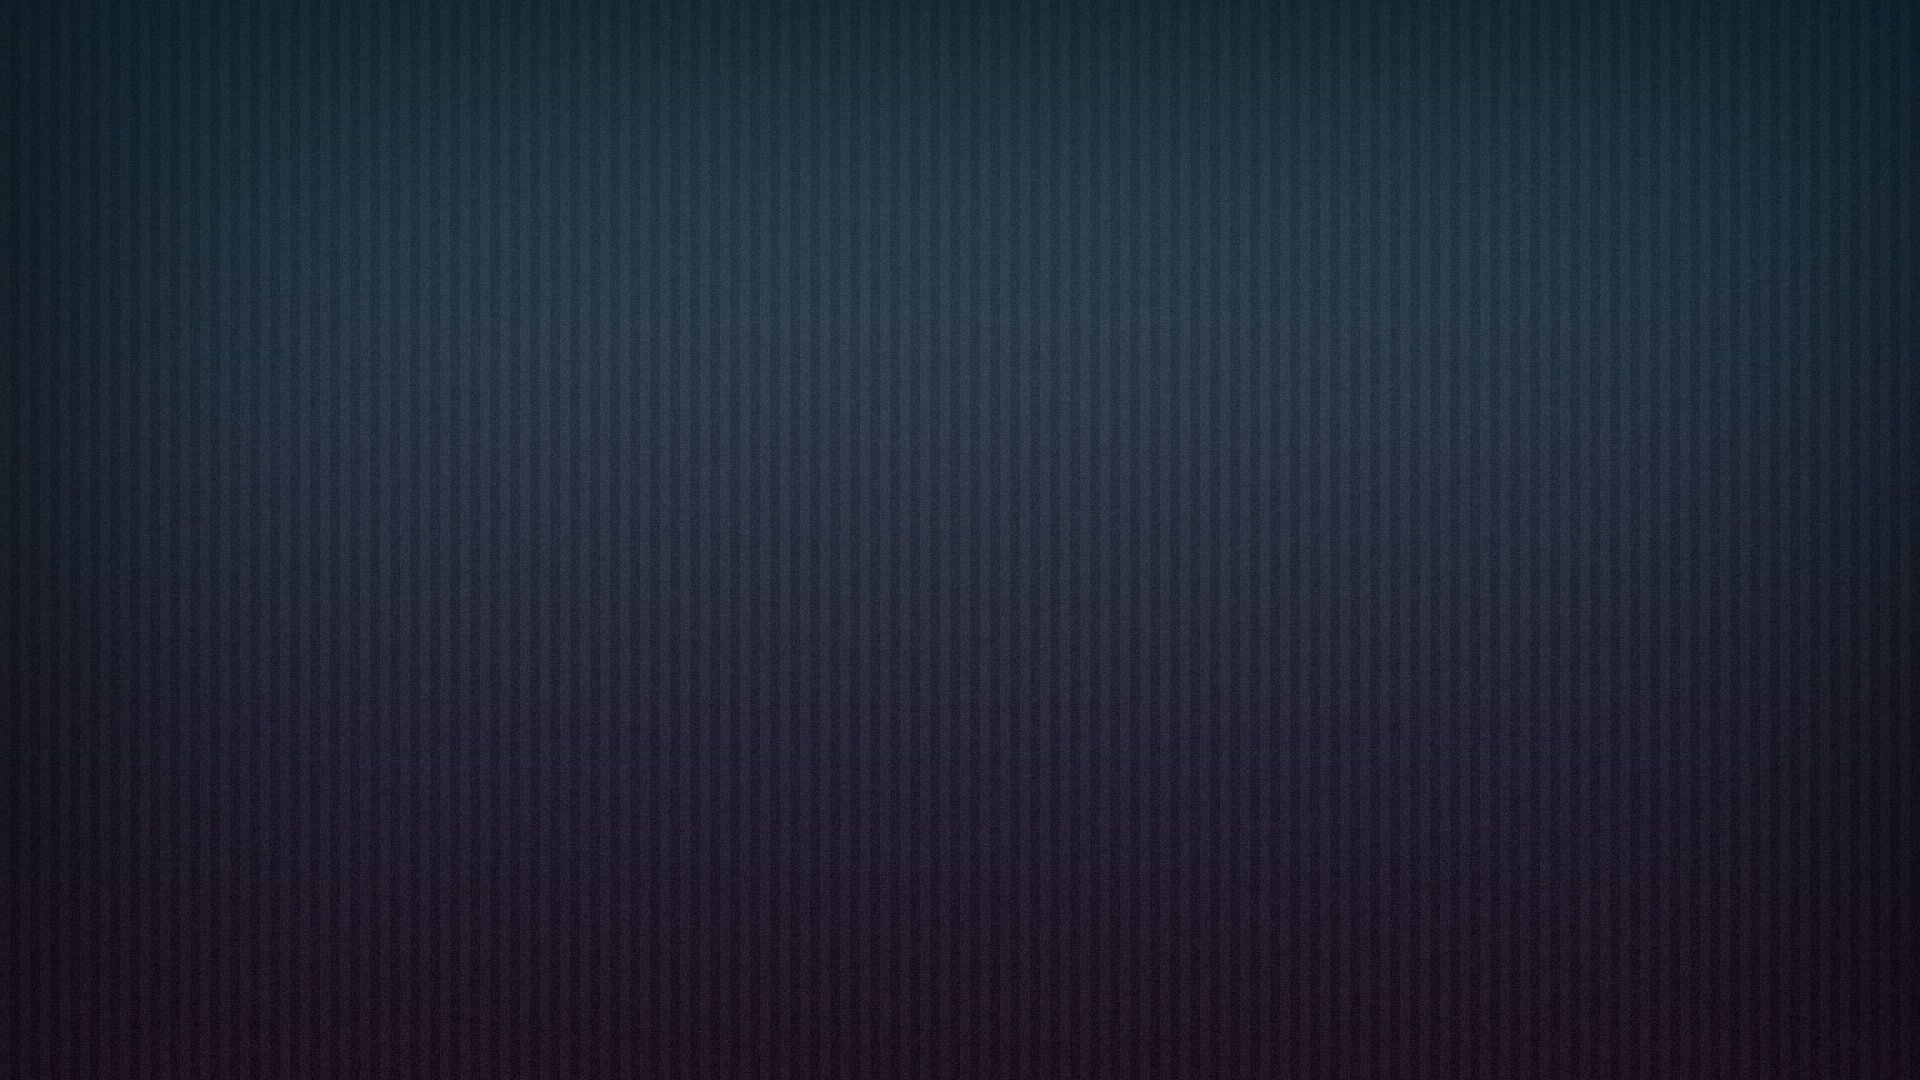 Website Background Texture